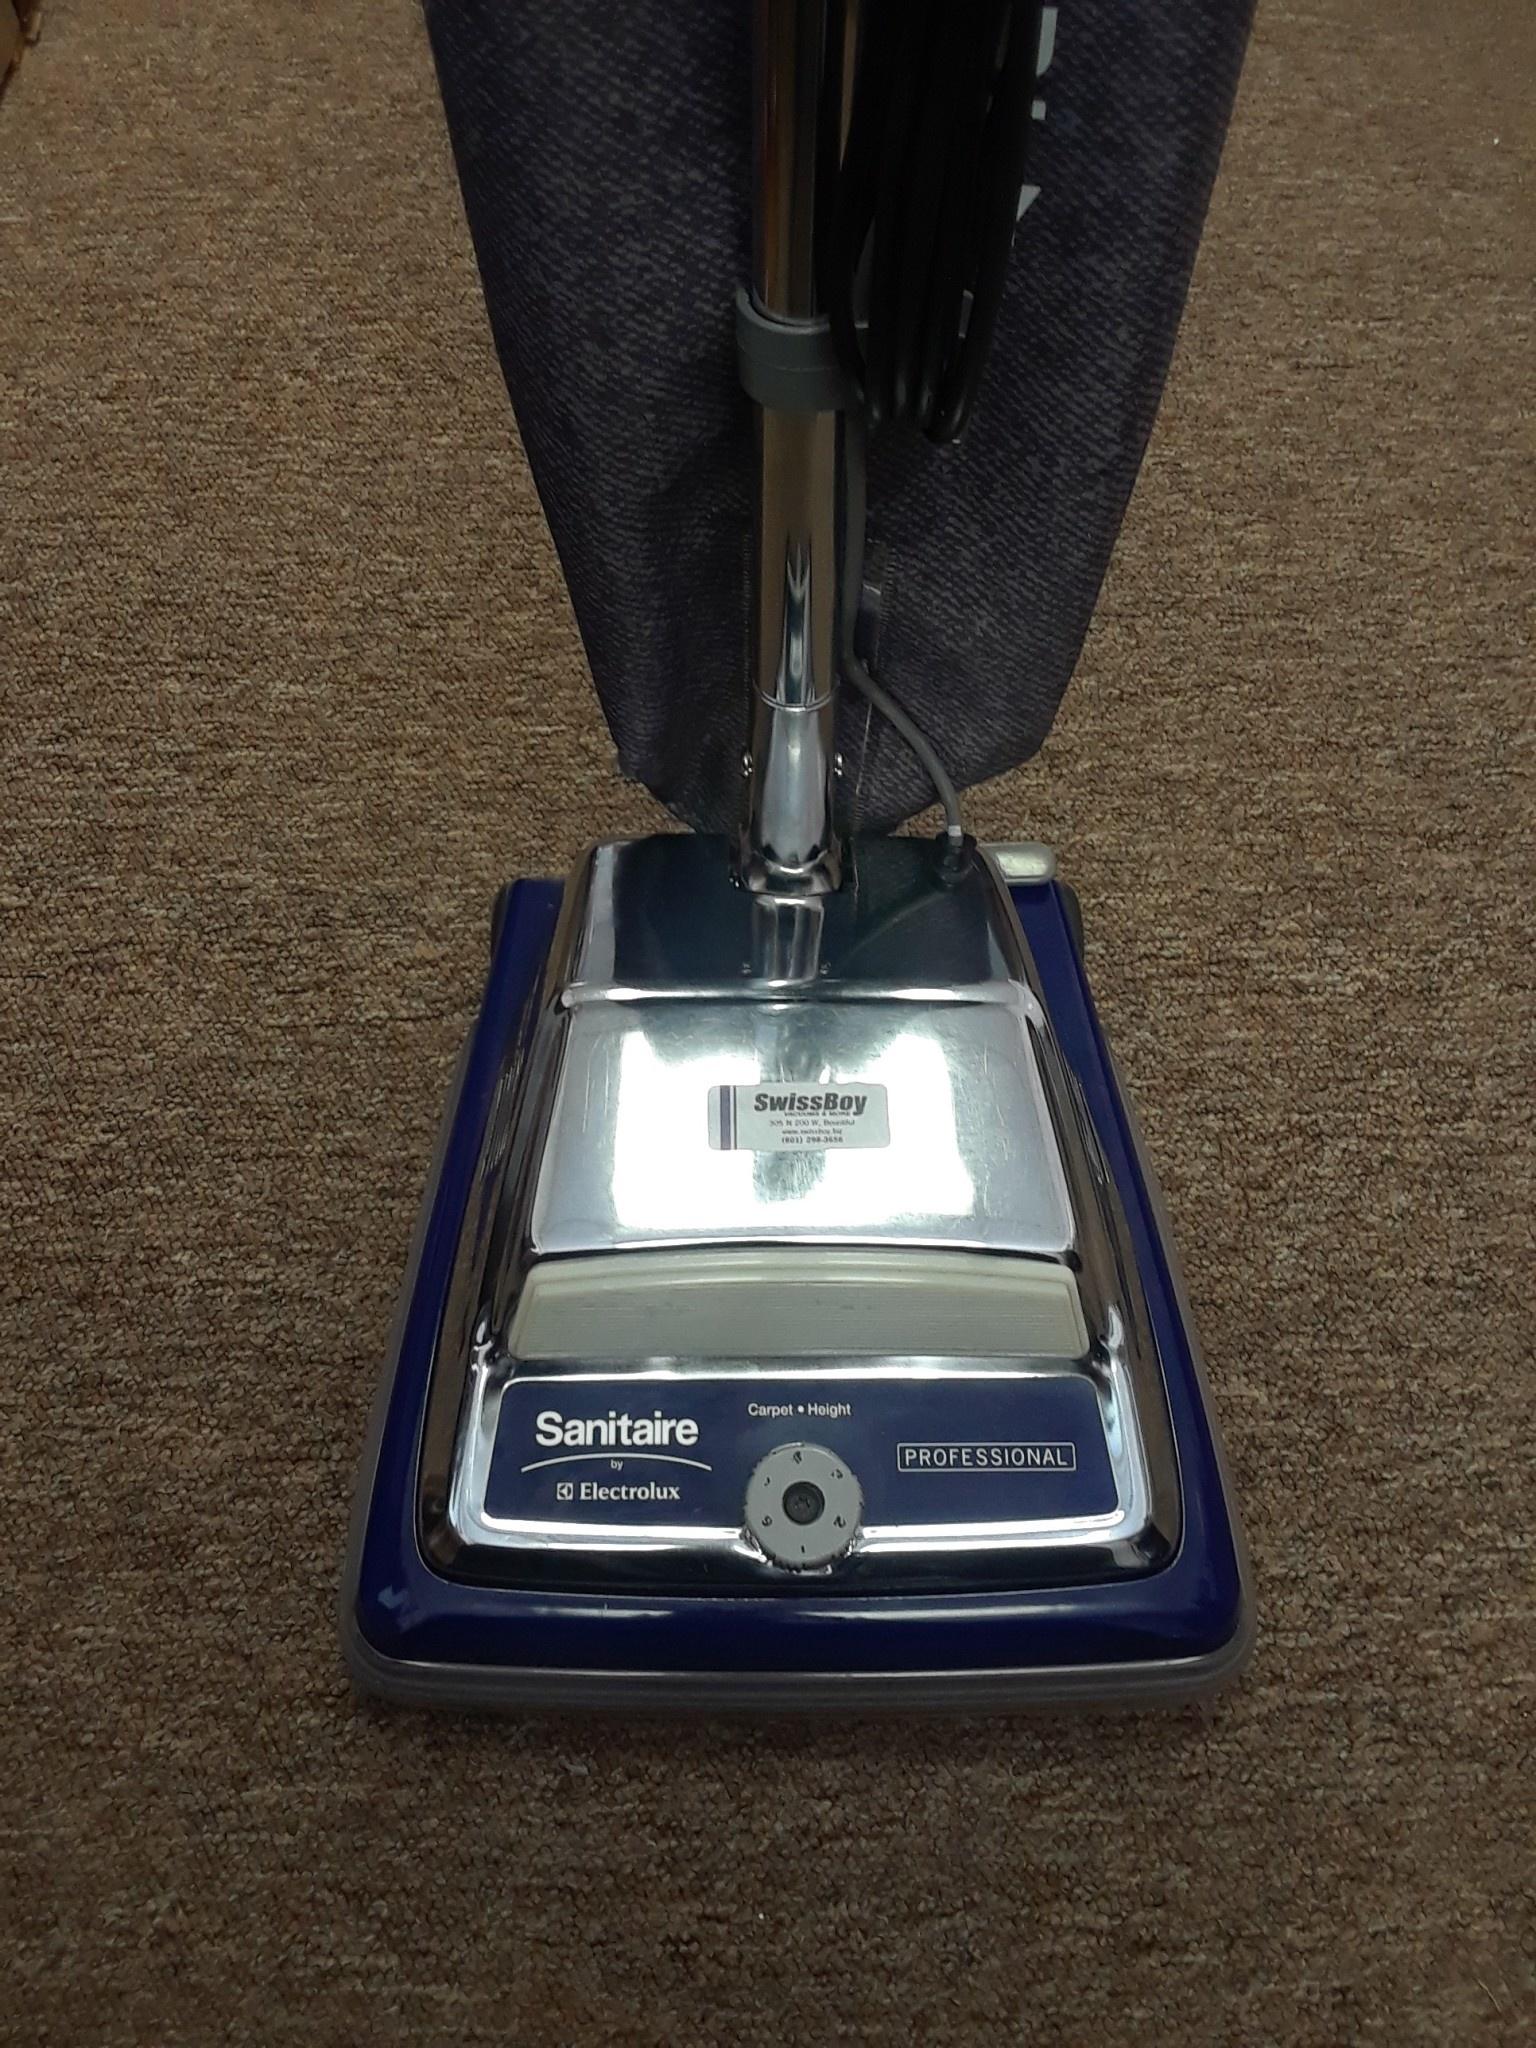 Sanitaire Refurbished Sanitaire Upright Vacuum - Sanitaire 677